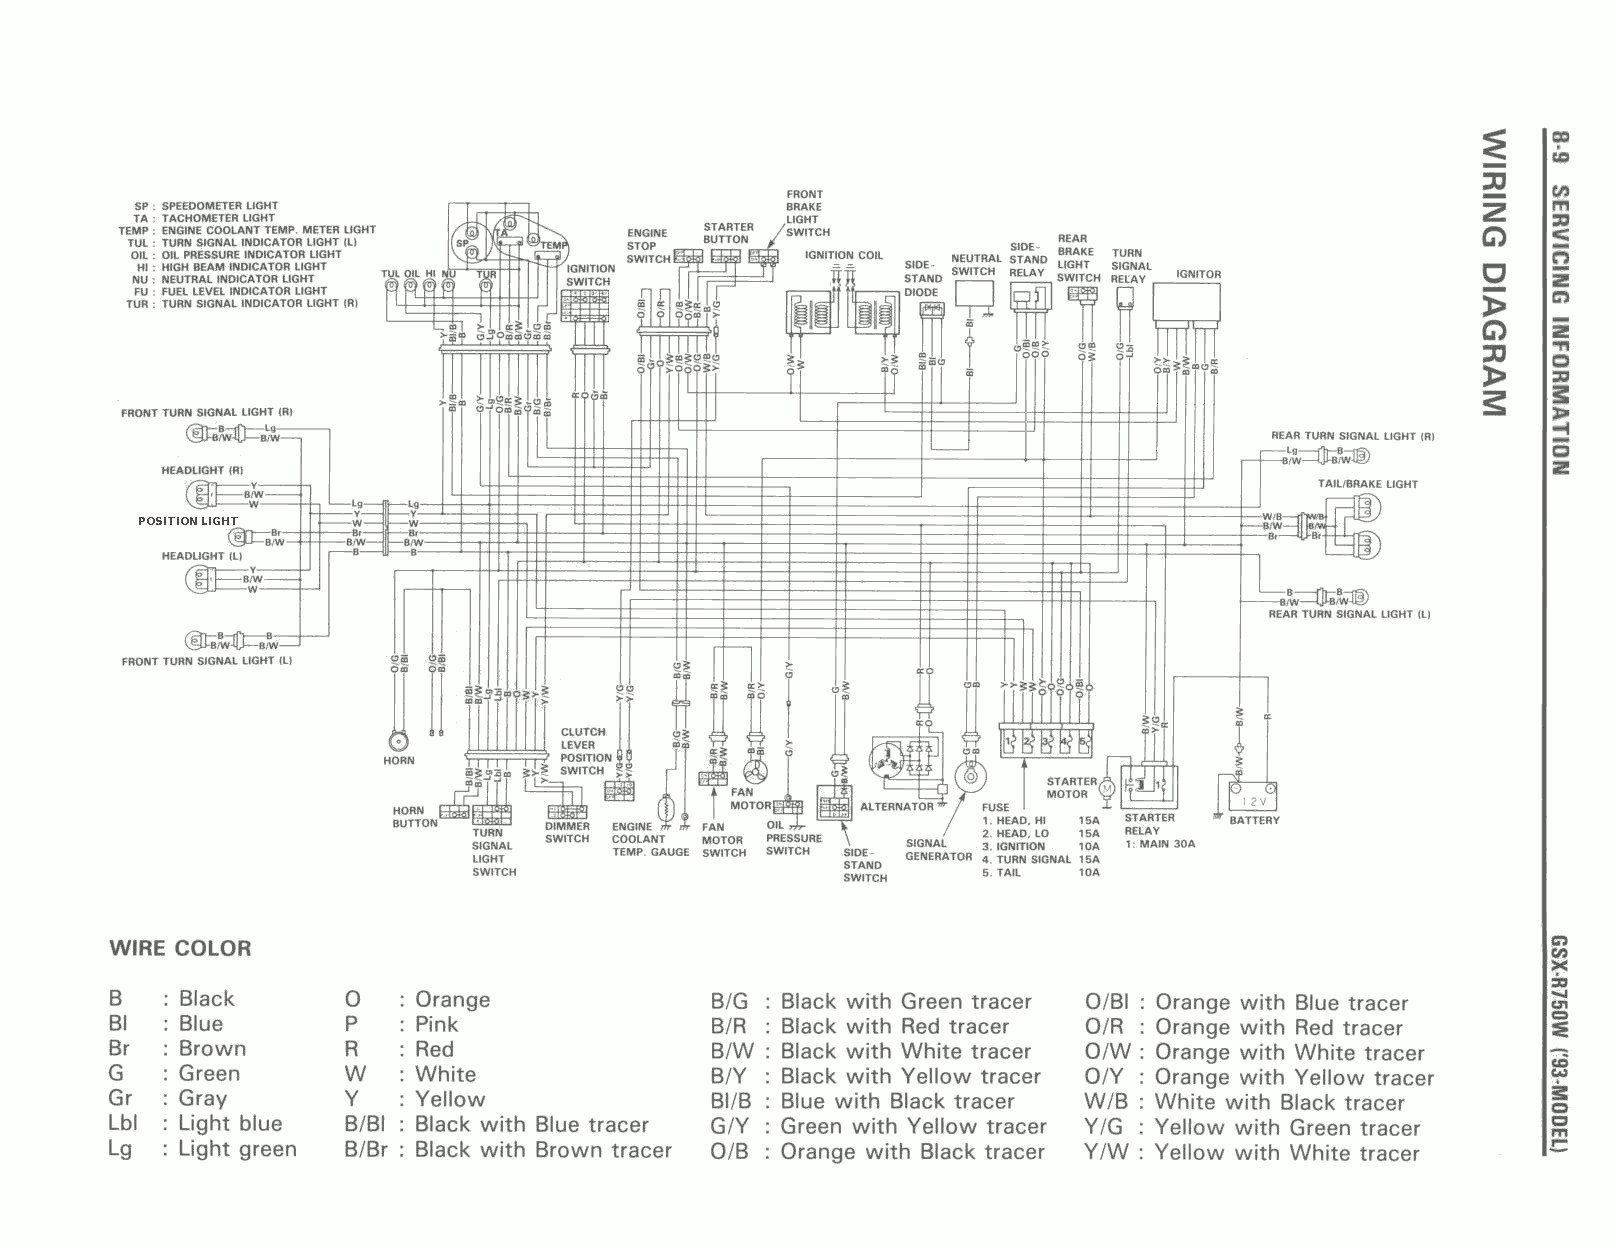 2005 Suzuki Gsxr 750 Wiring Diagram from static-cdn.imageservice.cloud